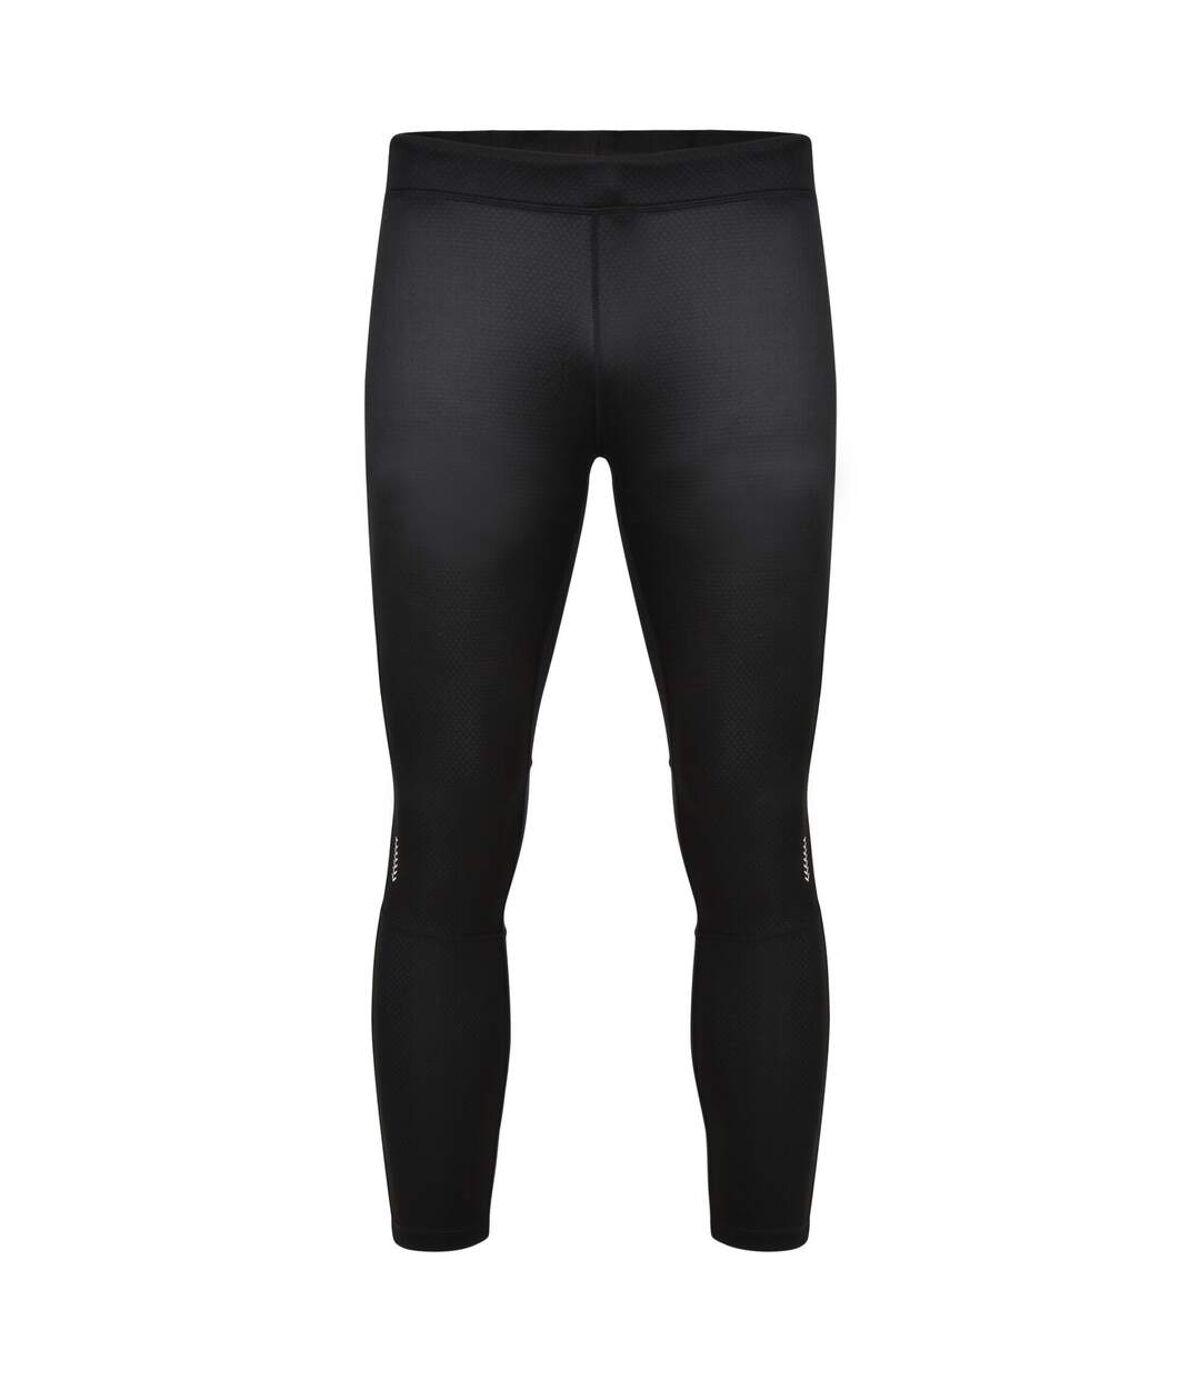 Dare 2B Mens Abaccus II Fitness Tights (Black) - UTRG5562